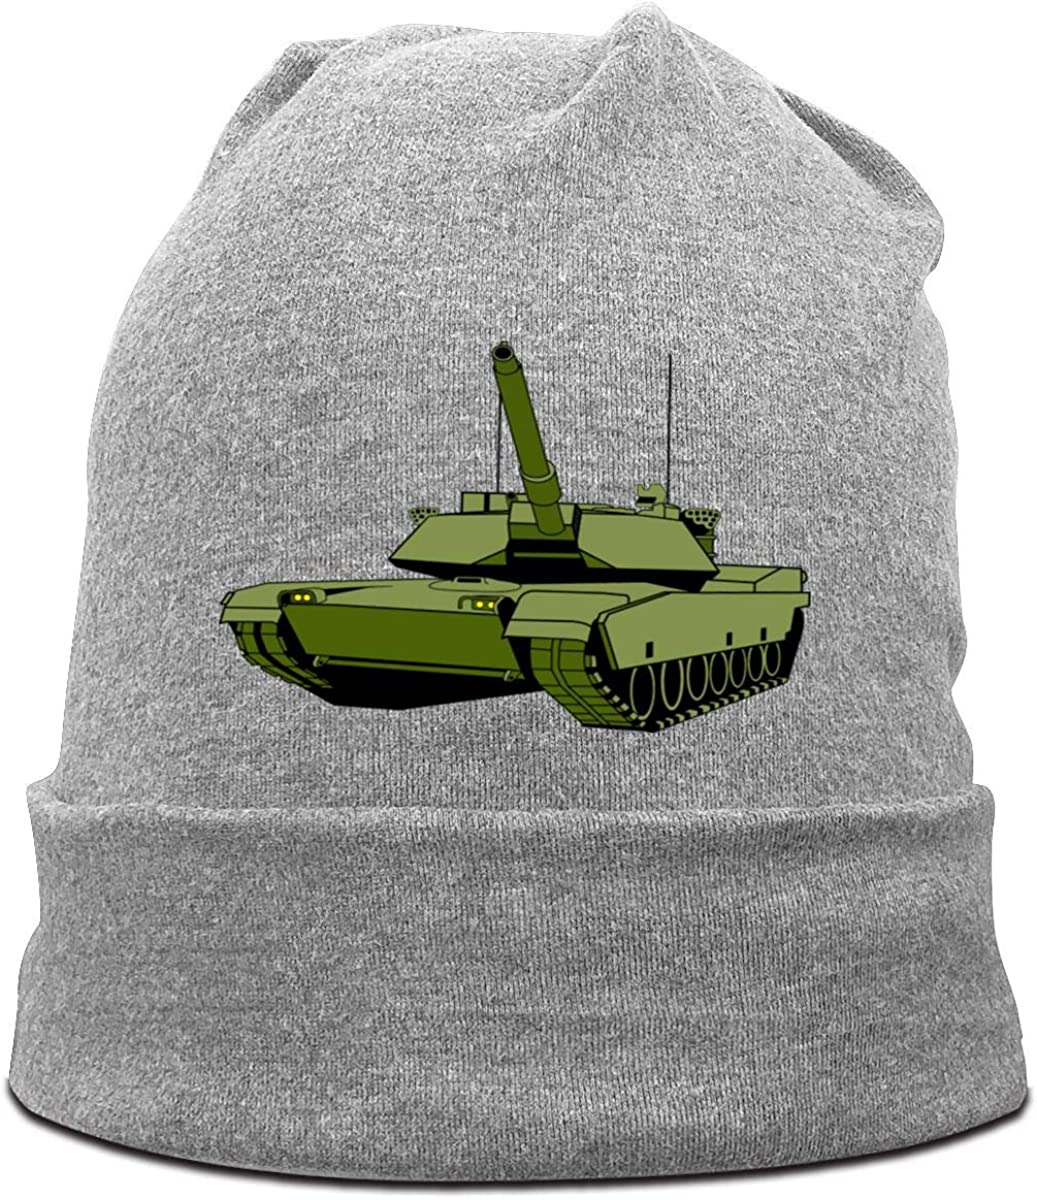 FOECBIR Cartoon Army Tank Soft Beanies Hat for Mens Winter Cap